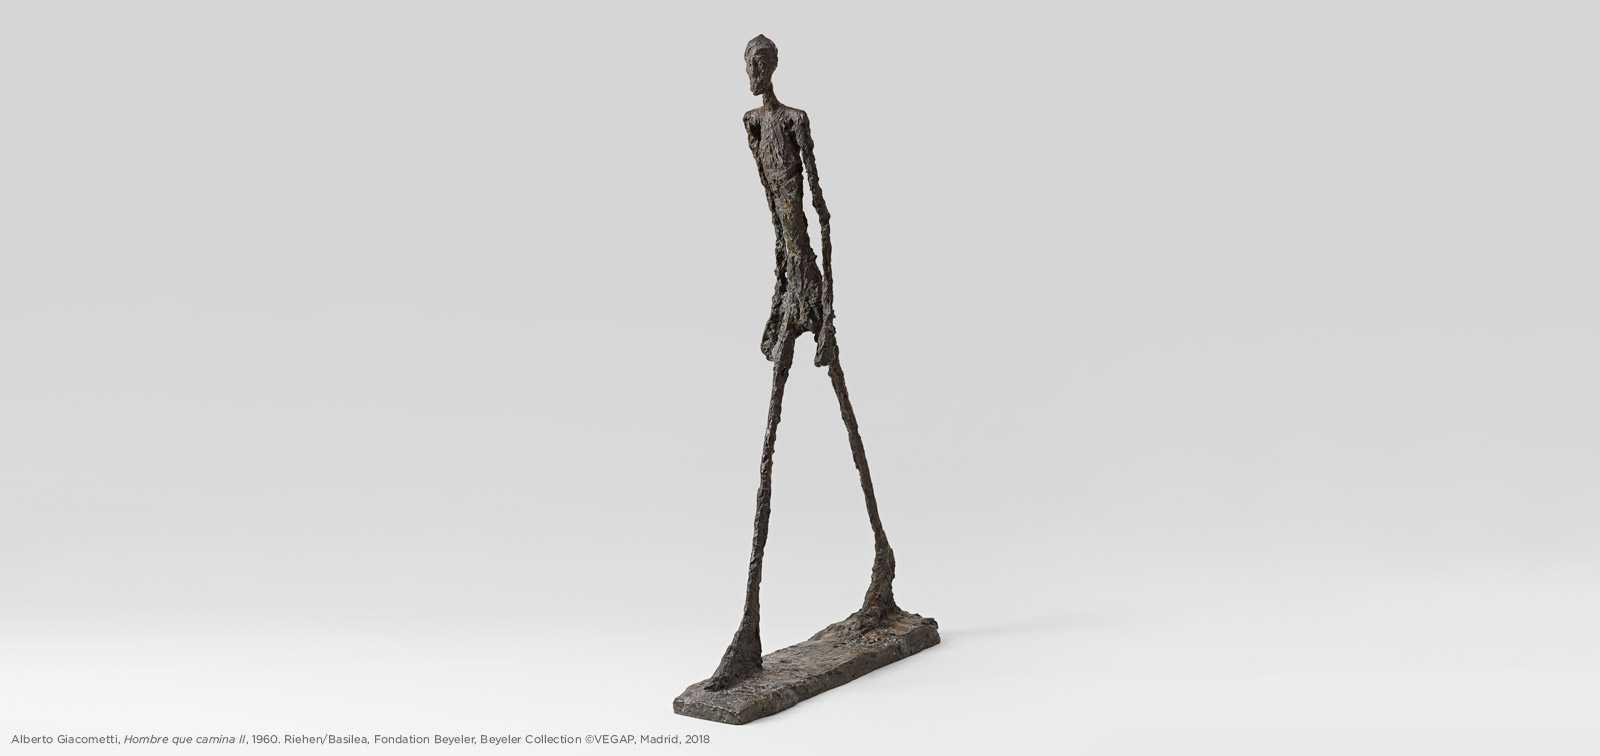 © Alberto Giacometti. Hombre que camina II. 1960. Riehen/Basilea, Fondation Beyeler, Beyeler Collection. VEGAP Madrid 2018